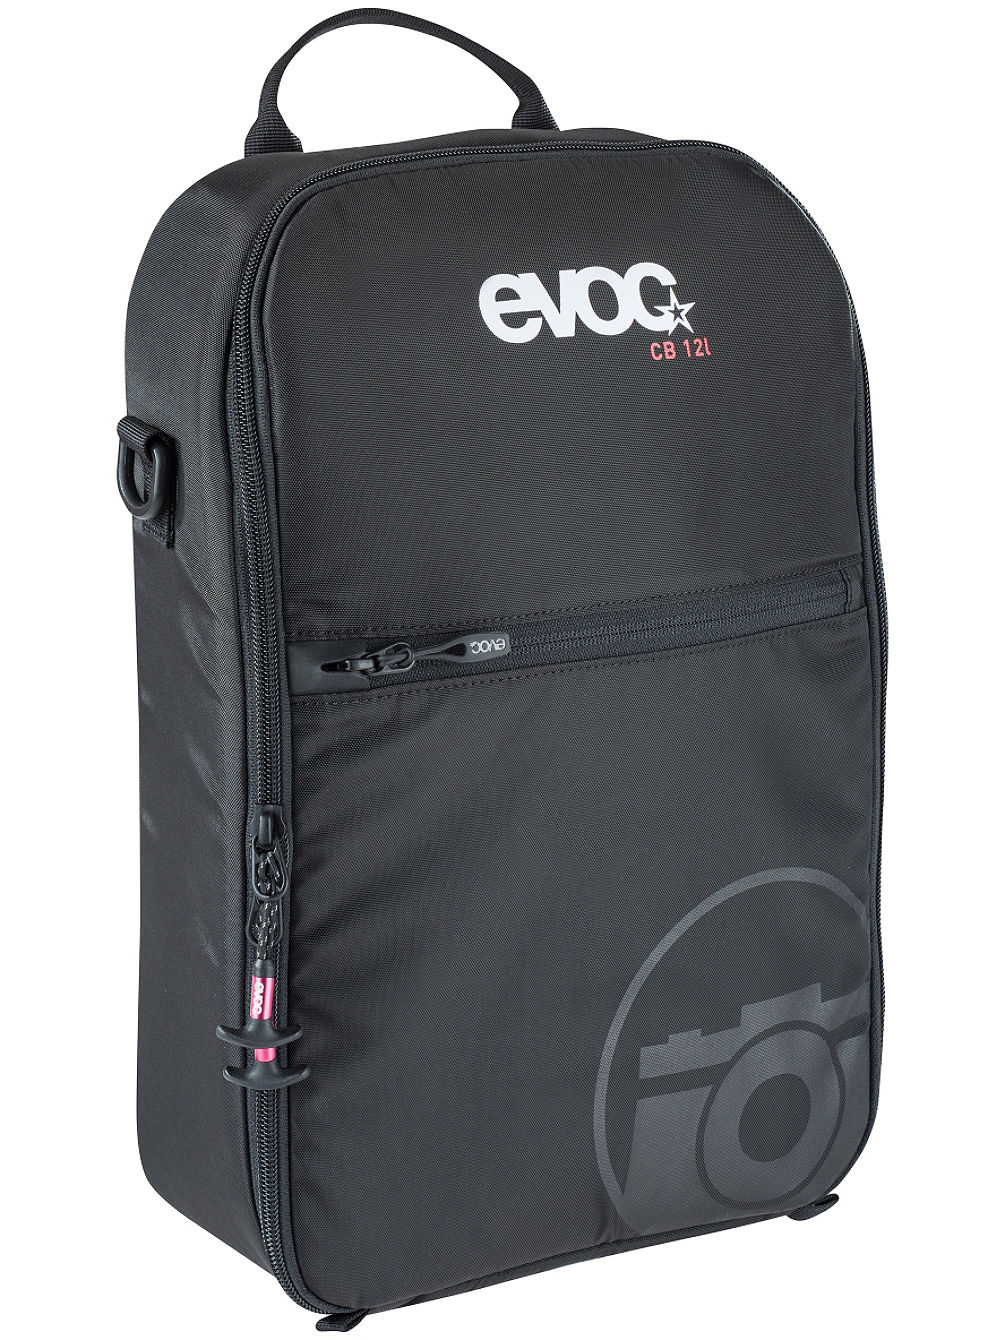 Evoc Camera Block 12L Backpack Nero- evoc - blue-tomato.com